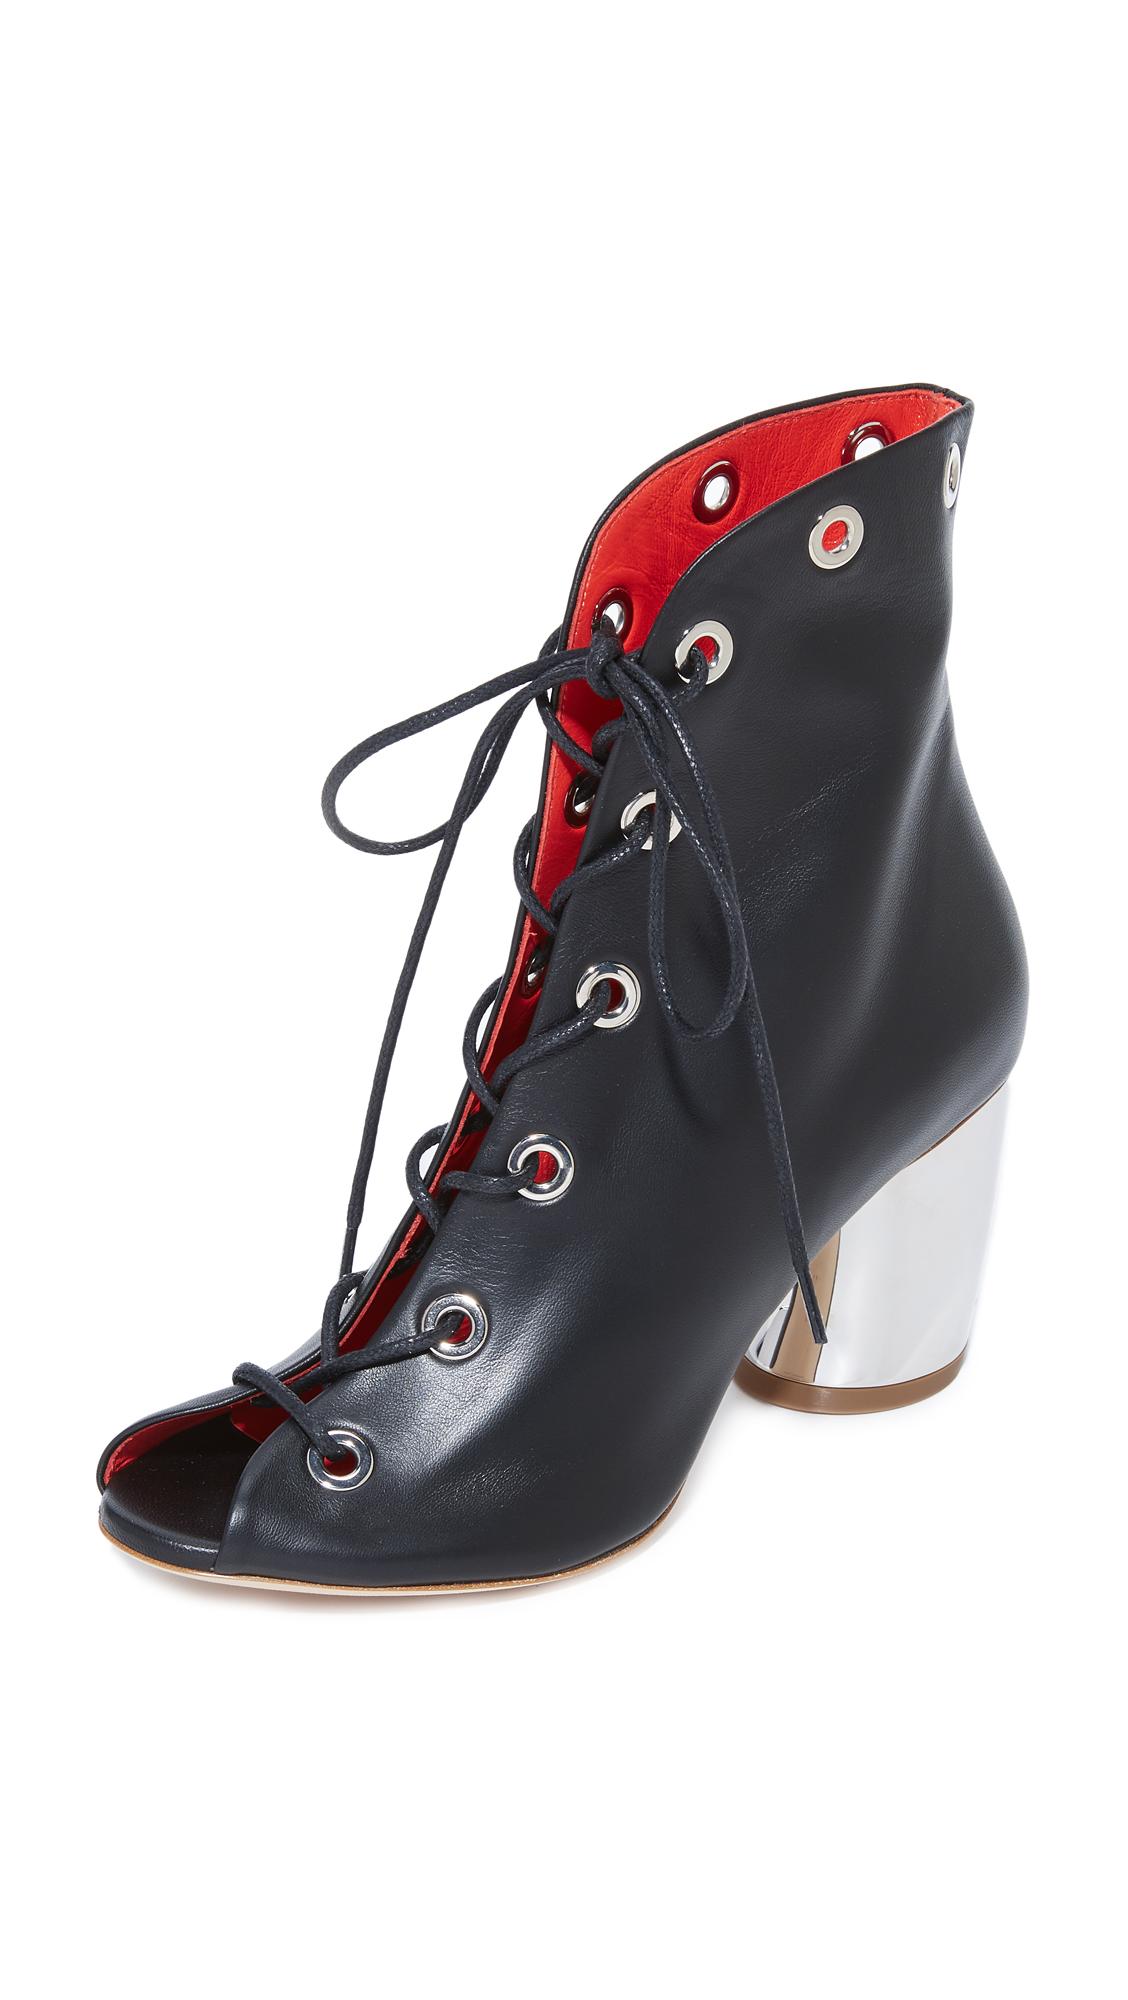 Proenza Schouler Shoes Price